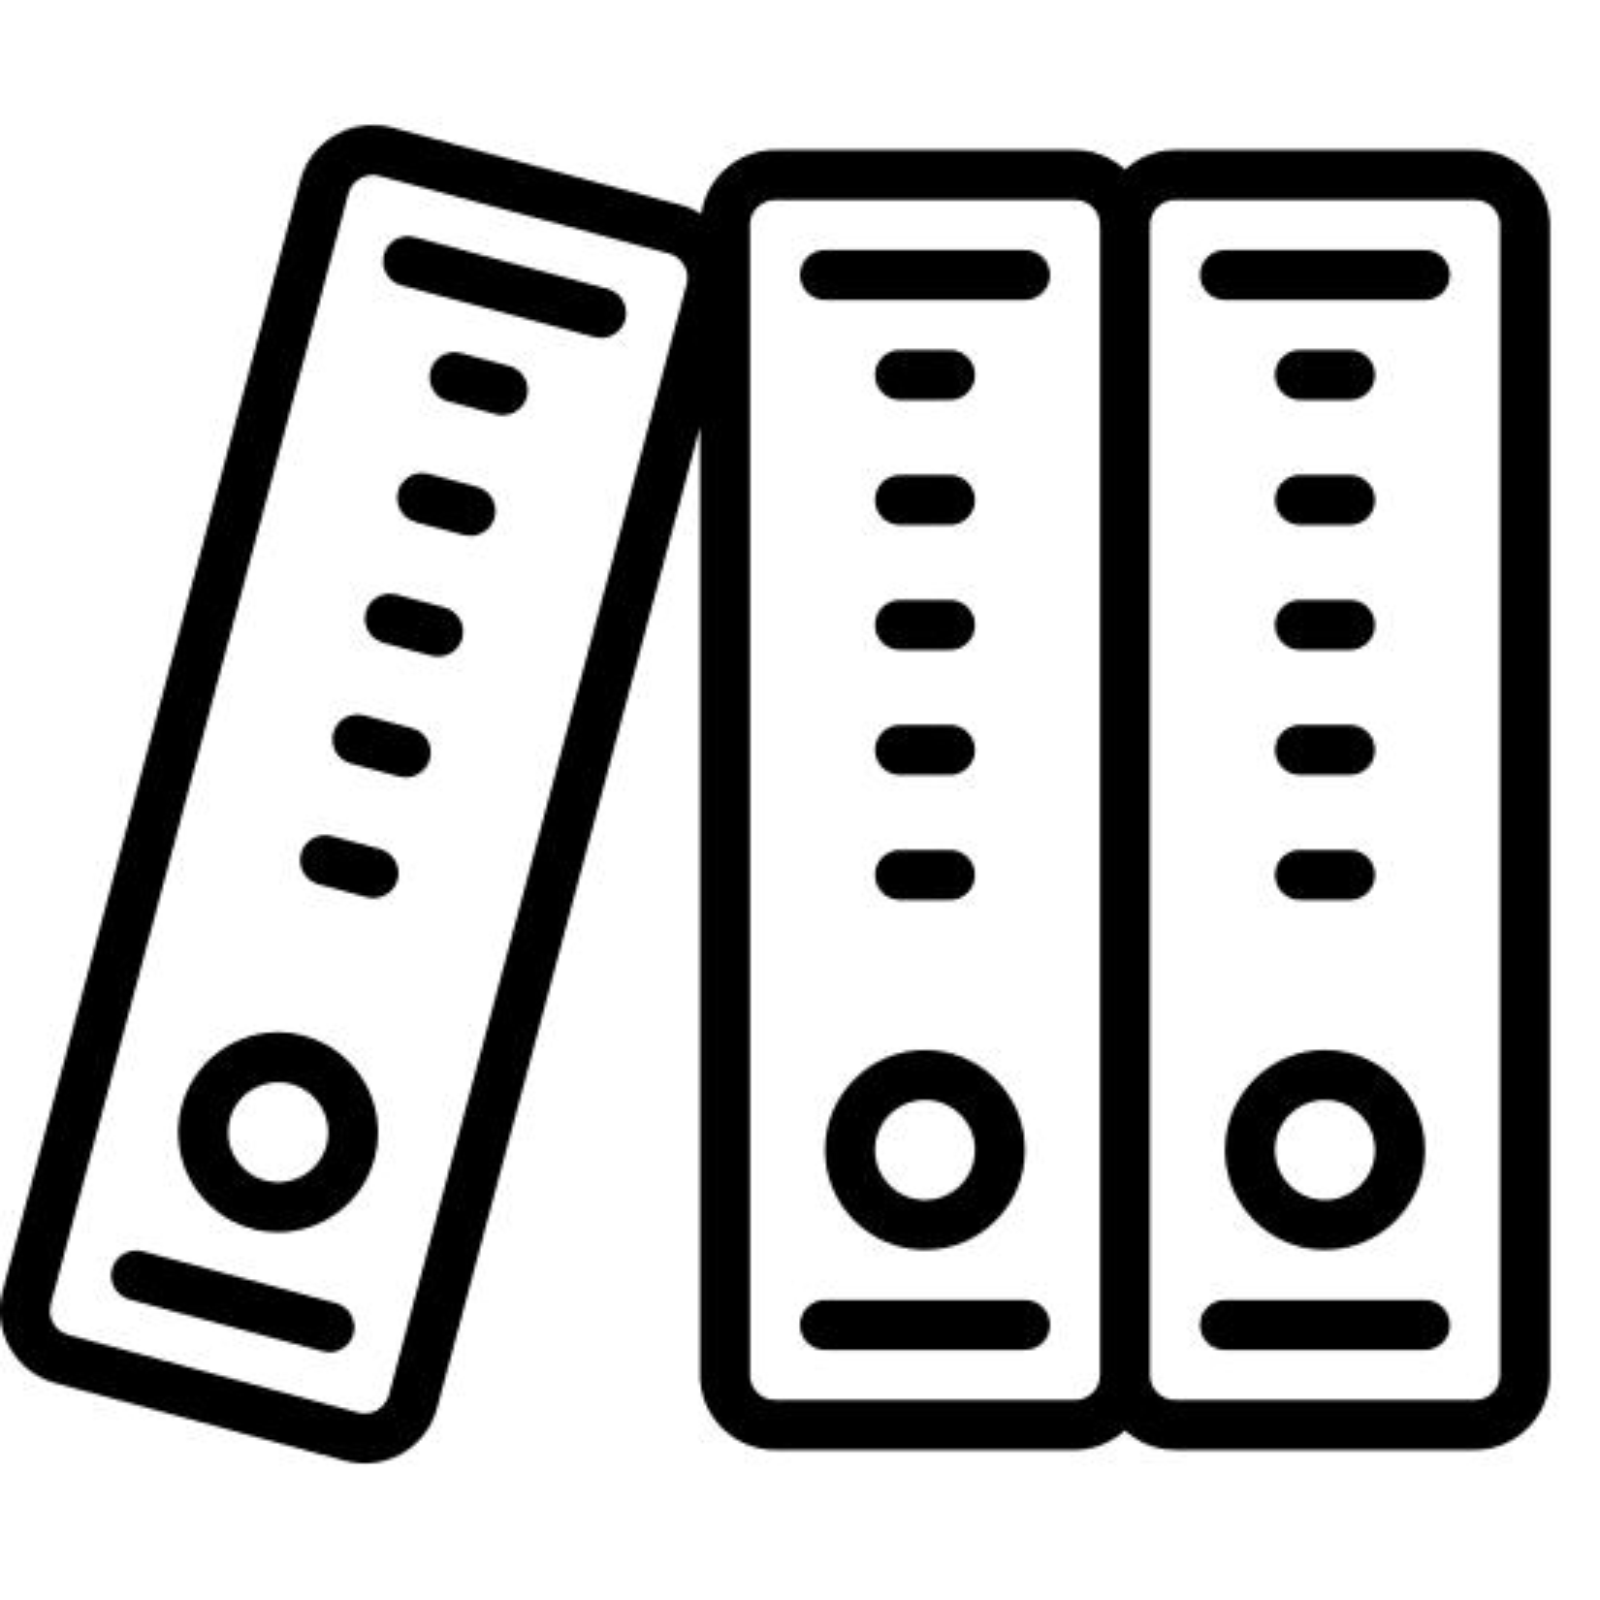 Encuadernador icon